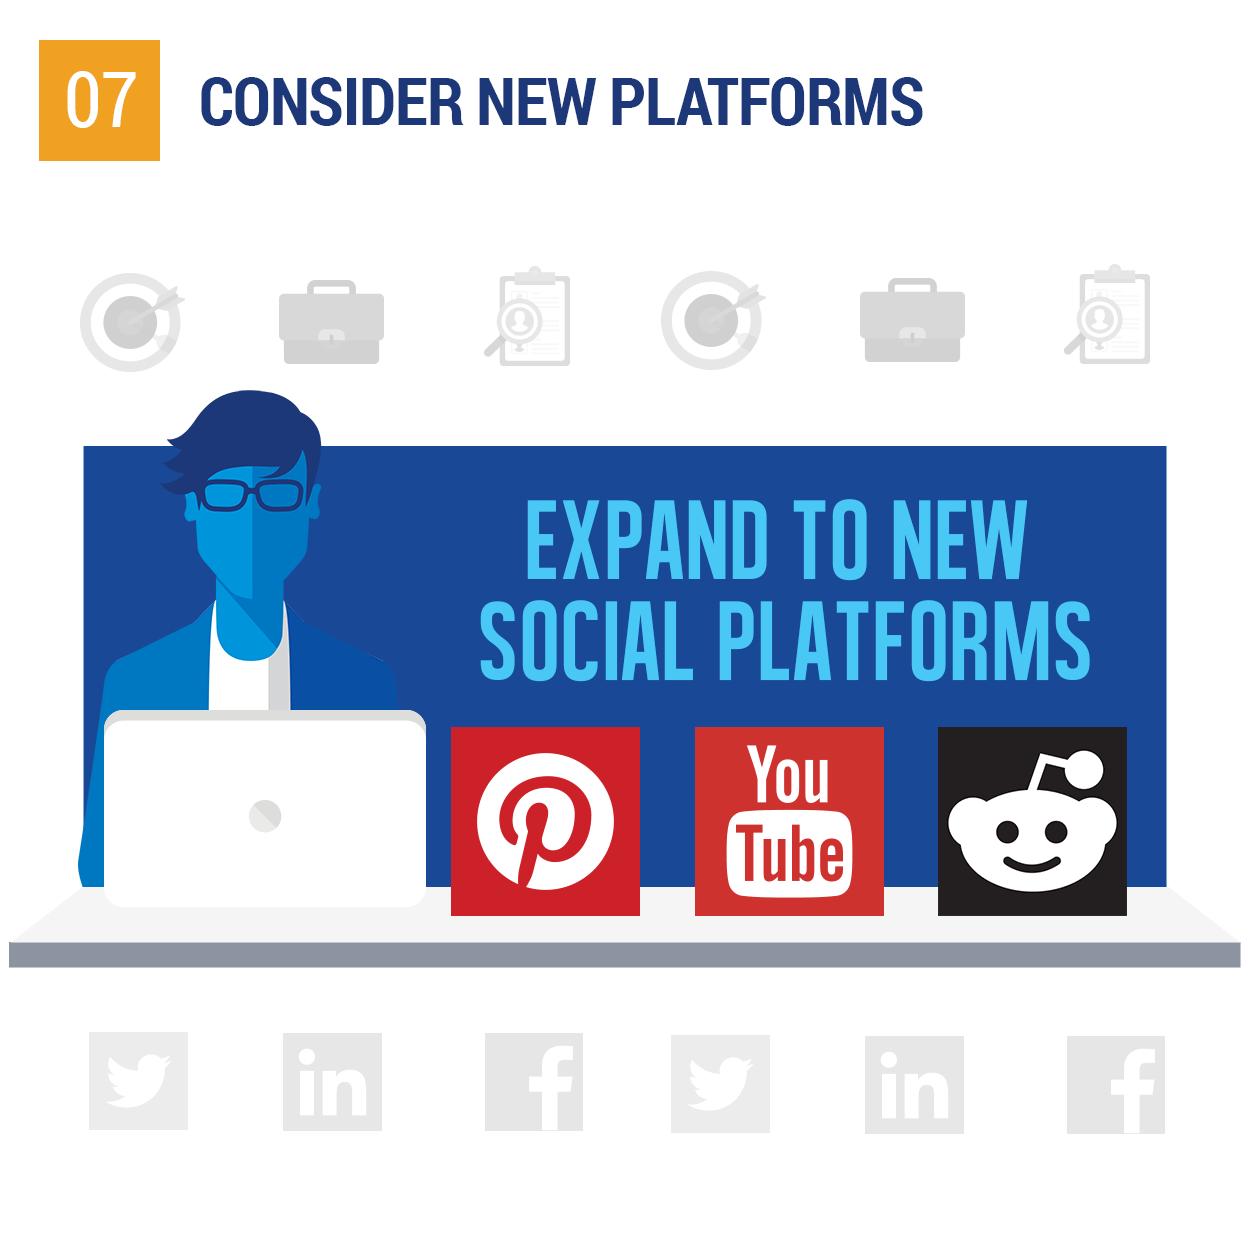 Consider new platforms